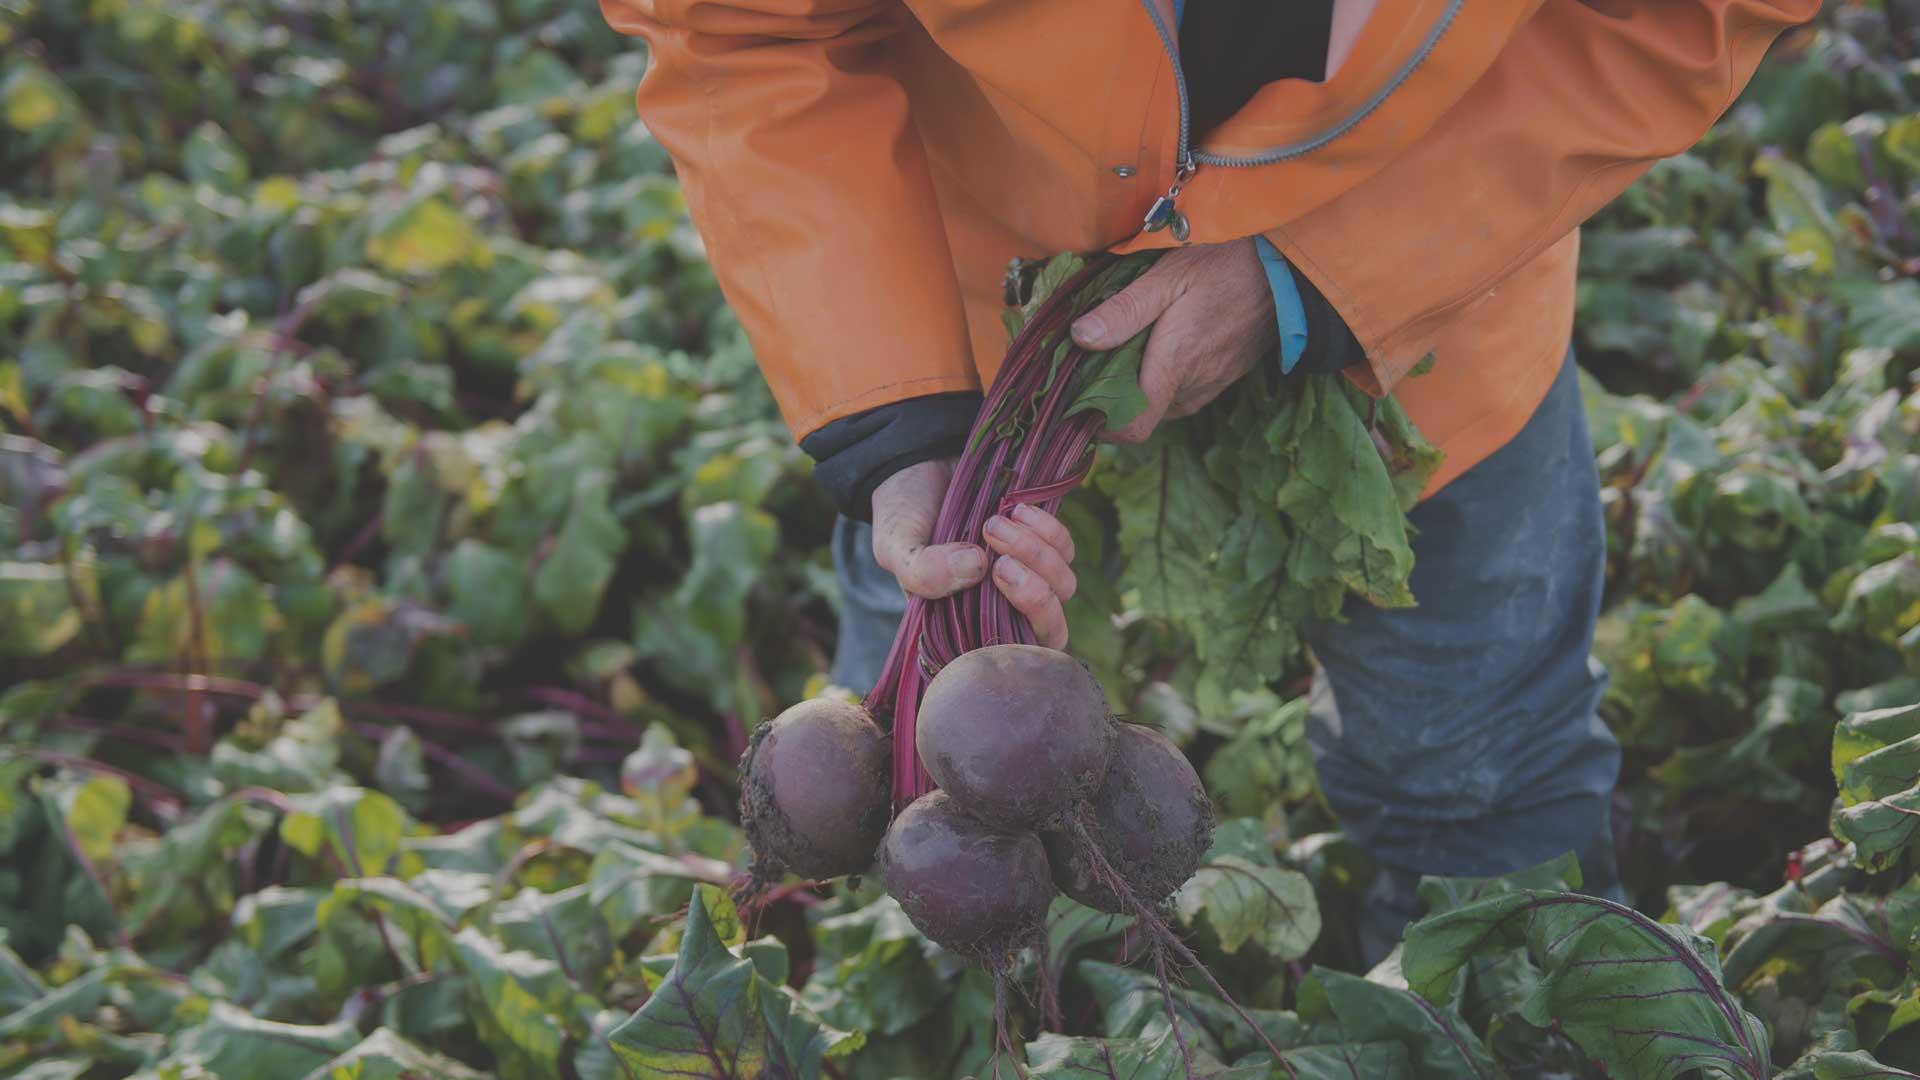 Organic Non-GMO Subeto F1 Beet from High Mowing Organic Seeds